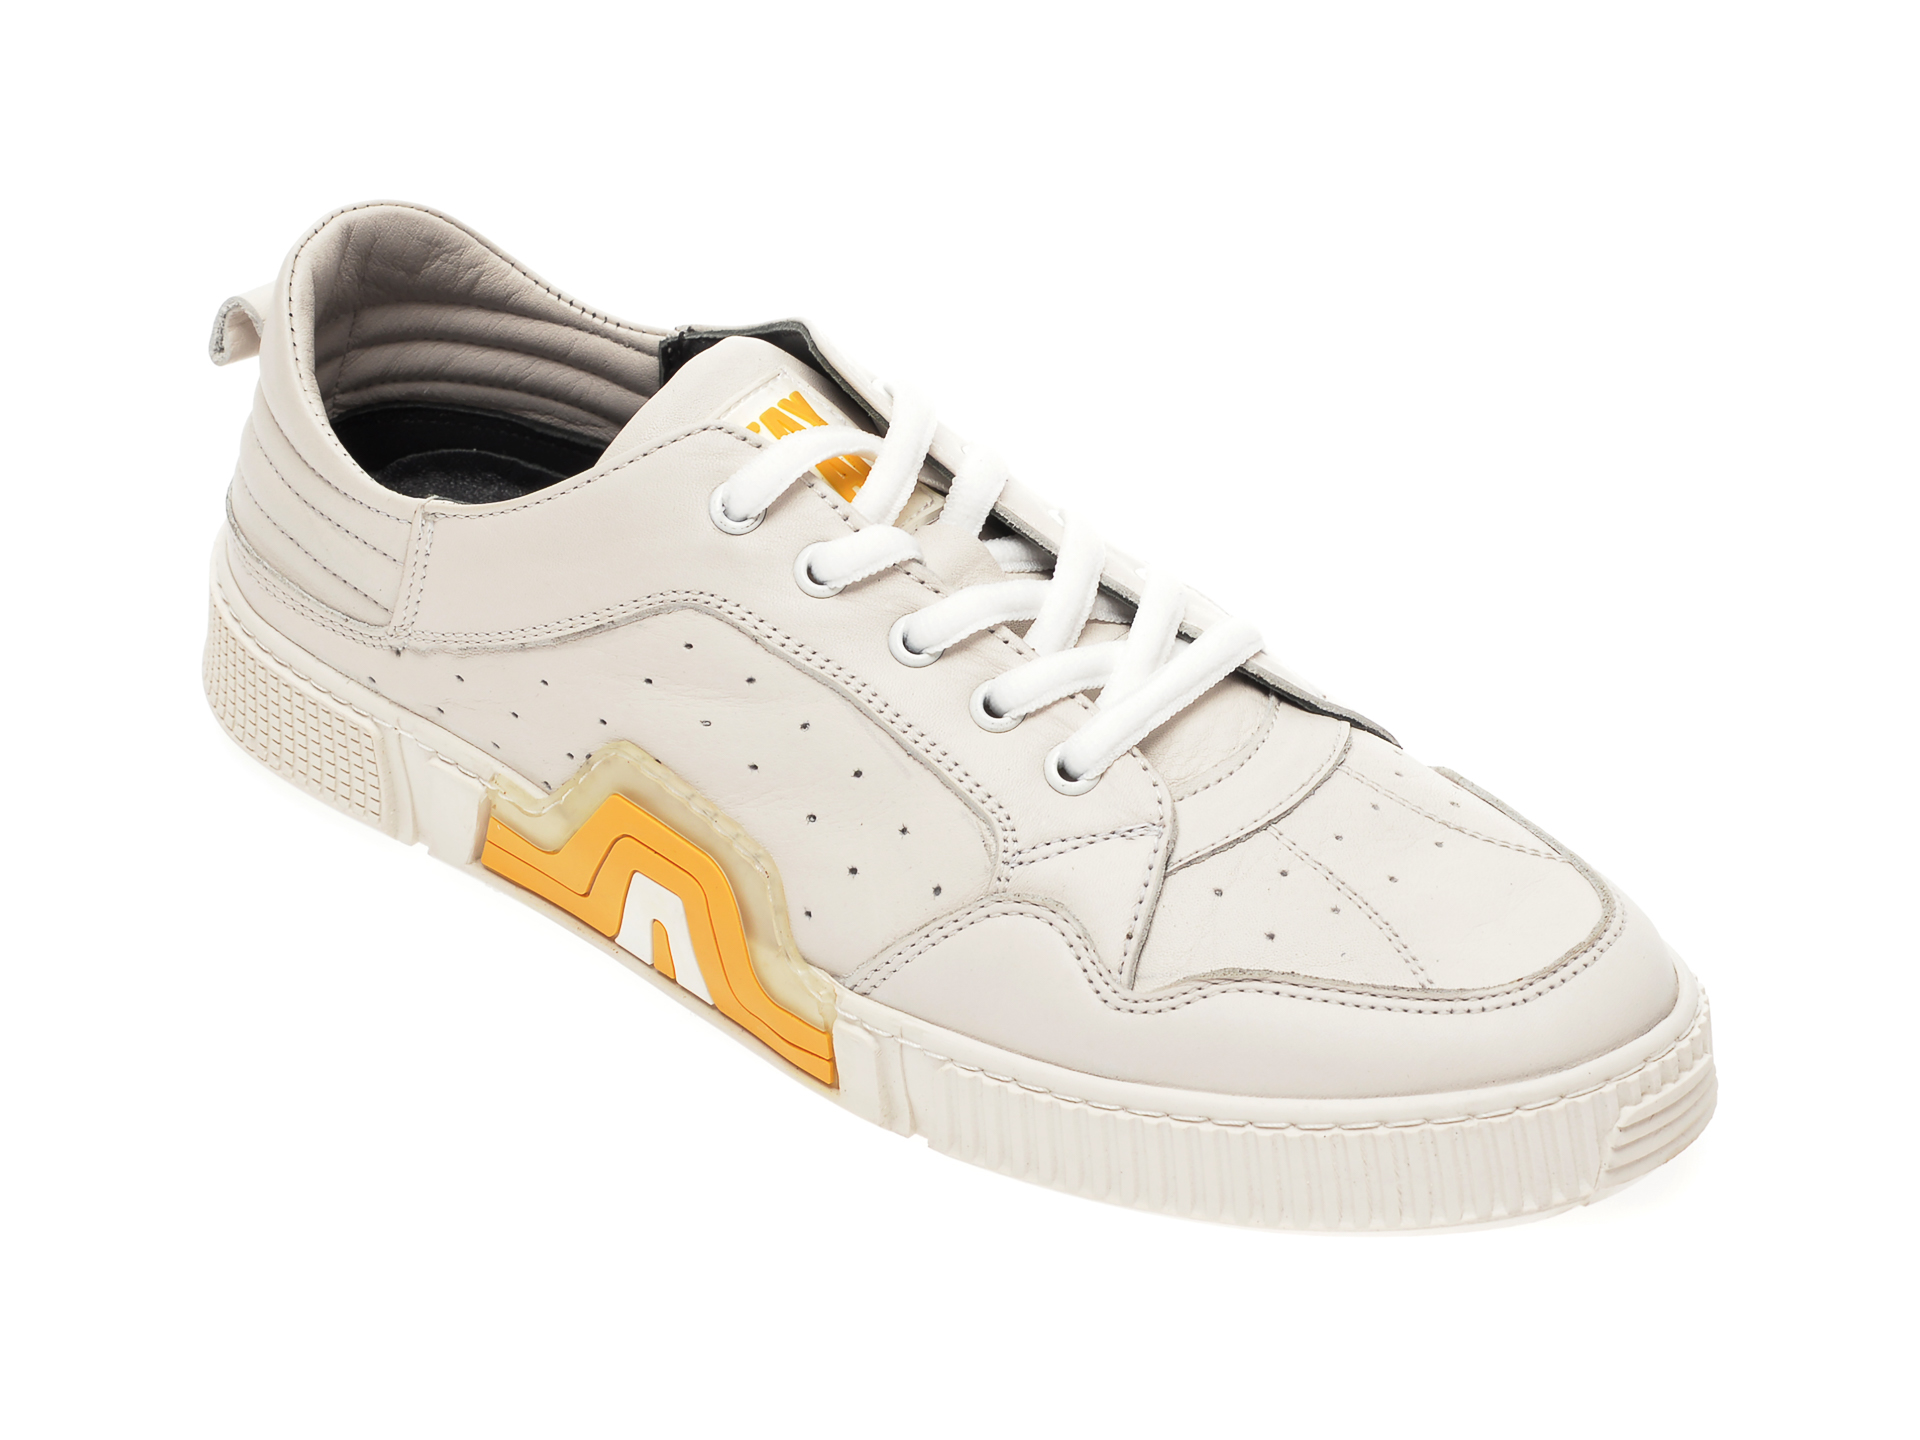 Pantofi OTTER albi, 72404, din piele naturala imagine